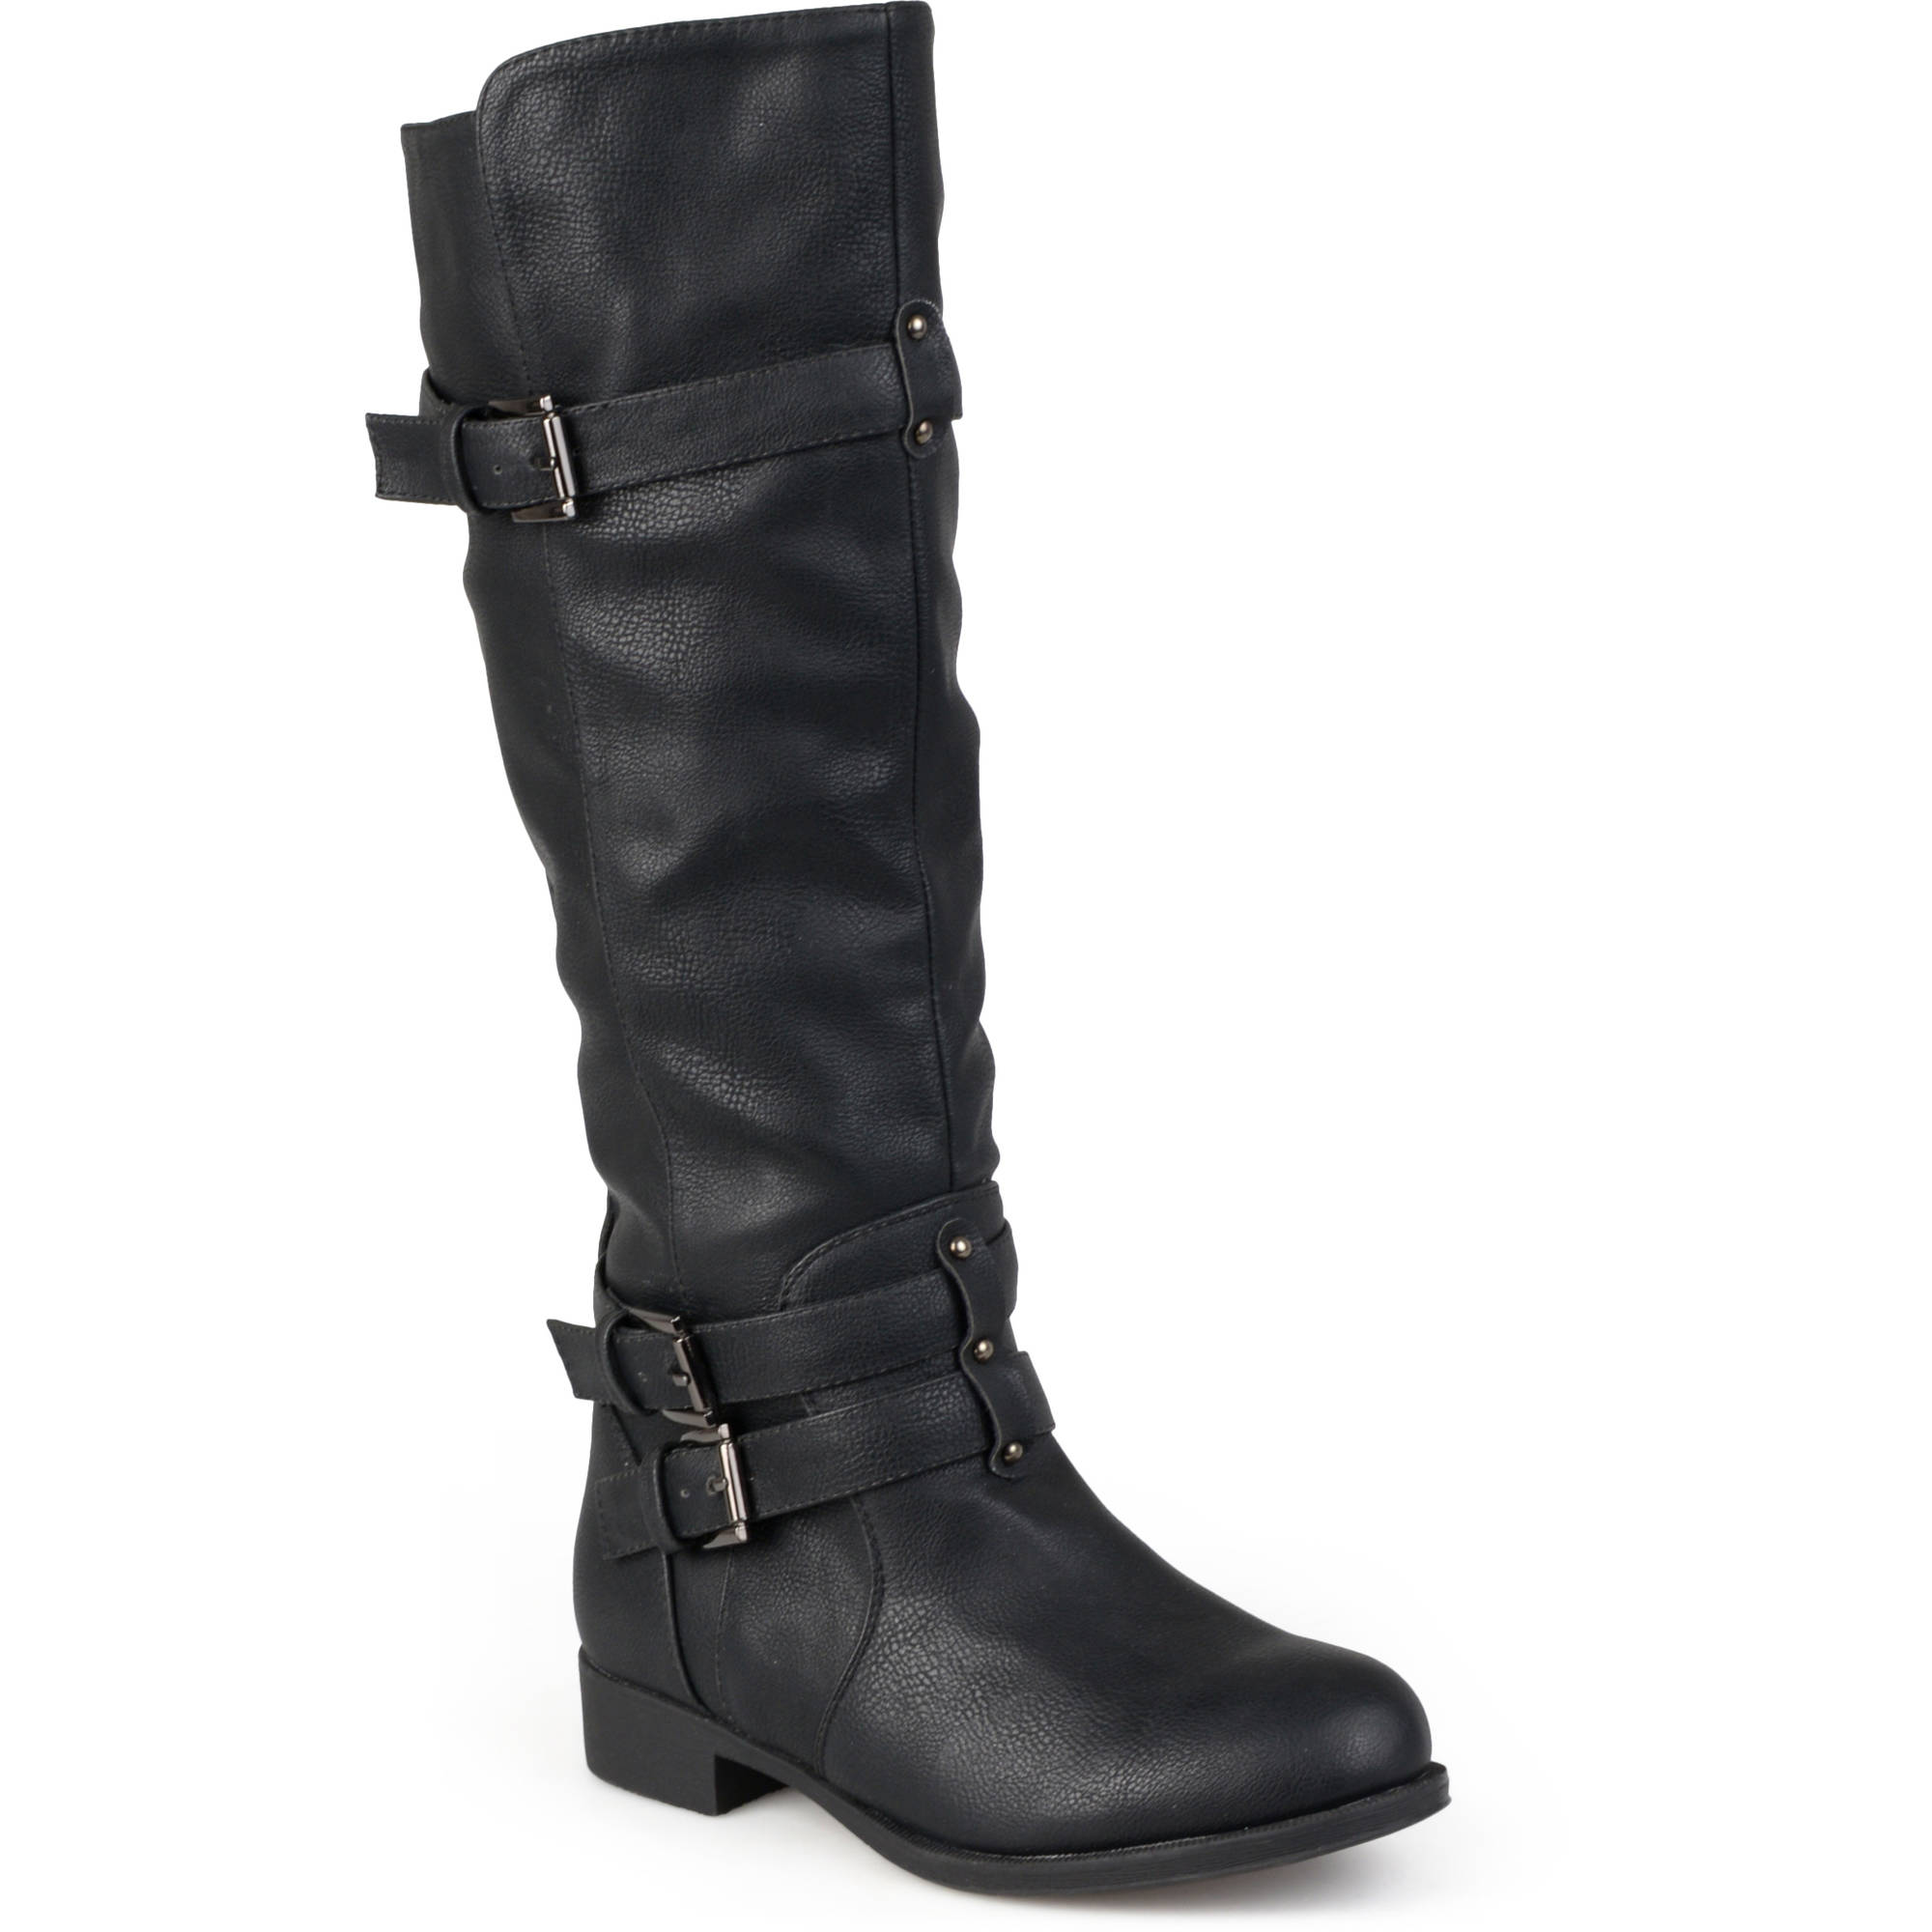 Women's Tall Buckle Detail Boots